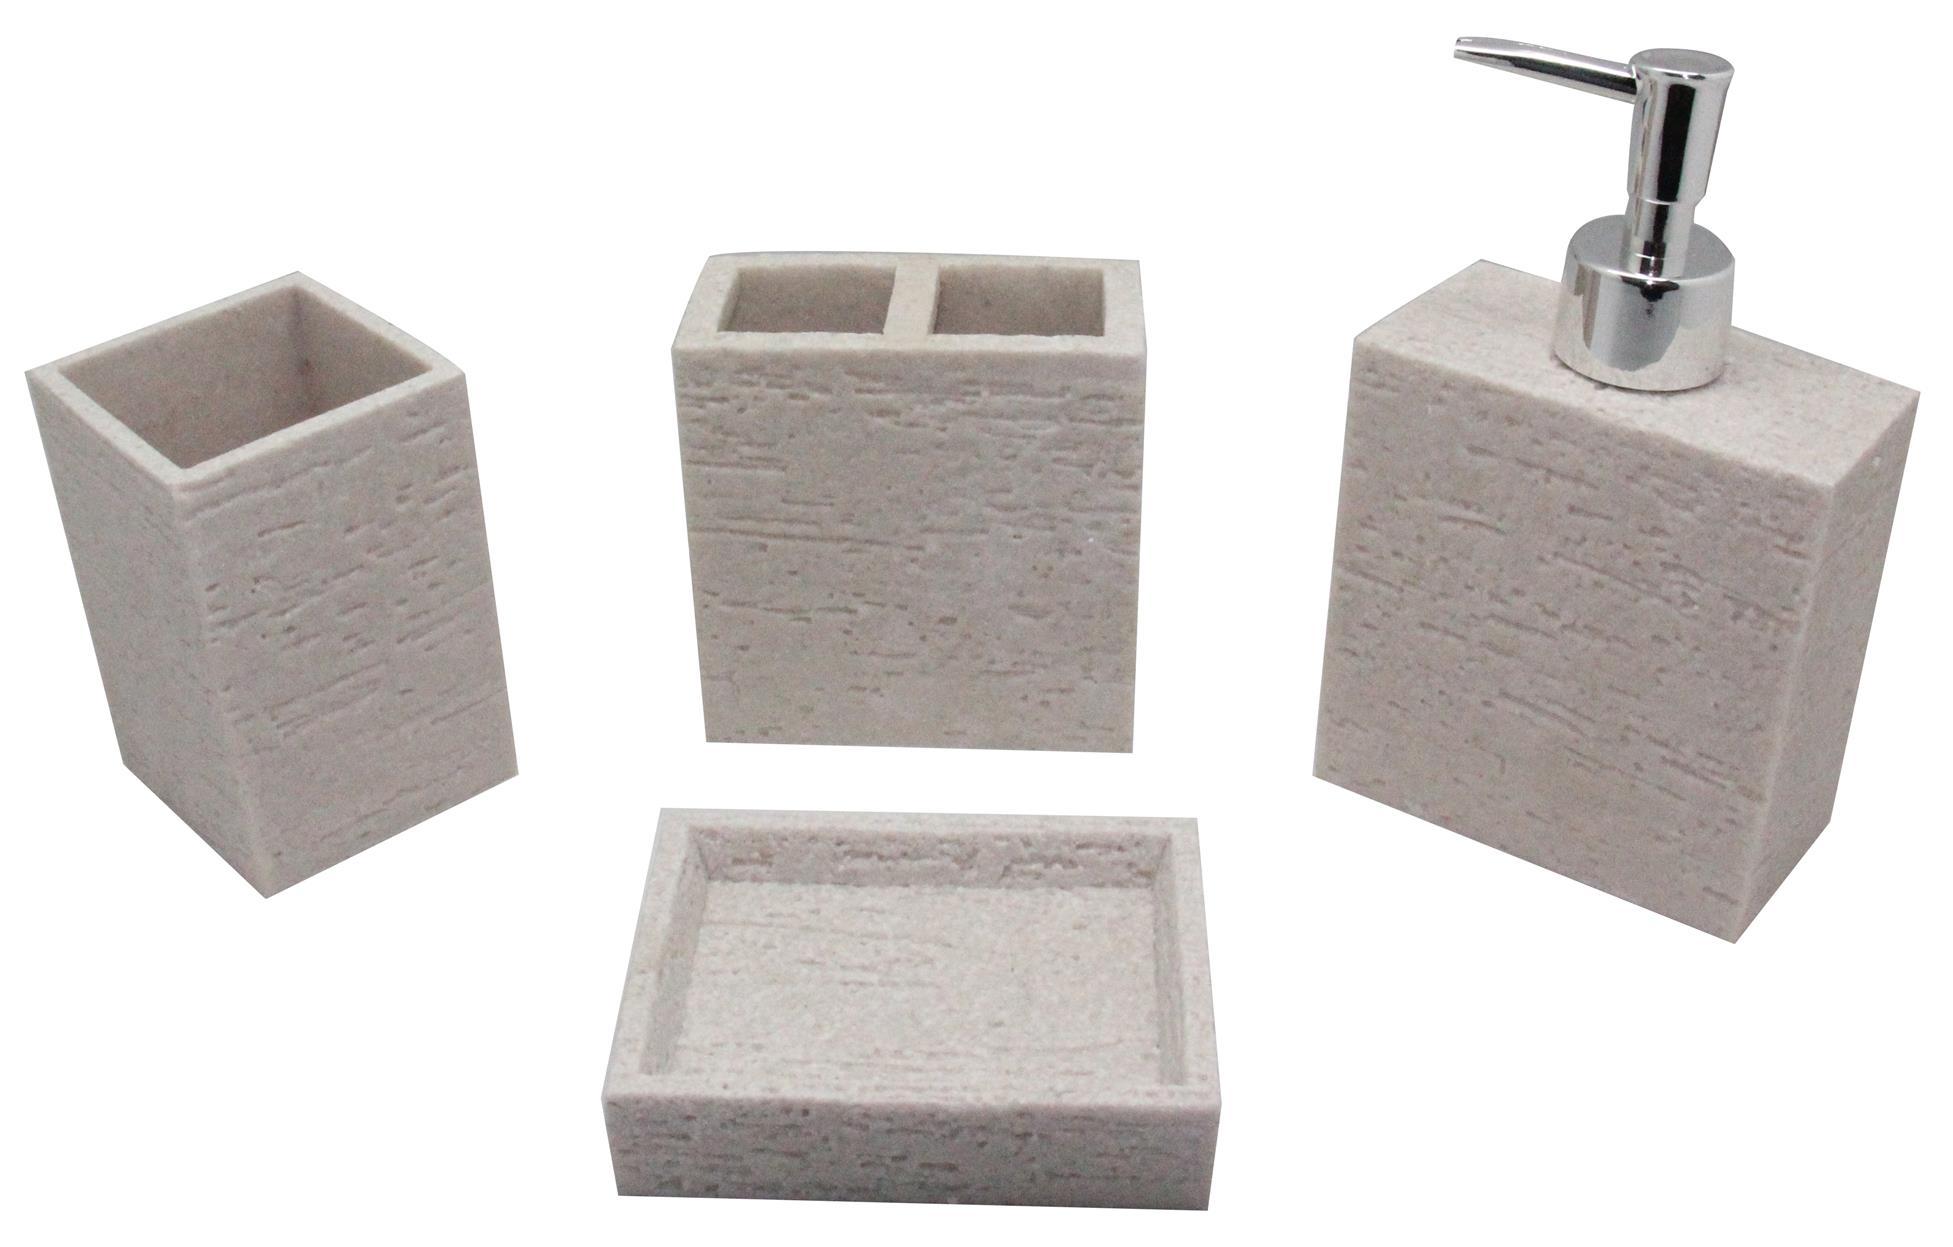 4pcs resin bathroom accessories set shampoo dispenser soap holder